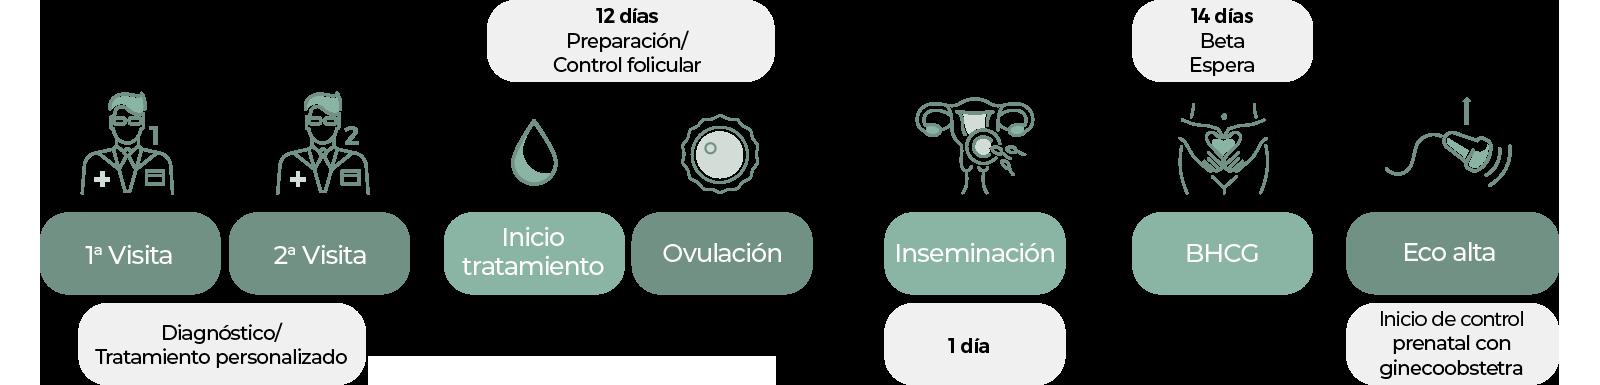 artificial insemination procedure at Centro Fecundar Costa Rica